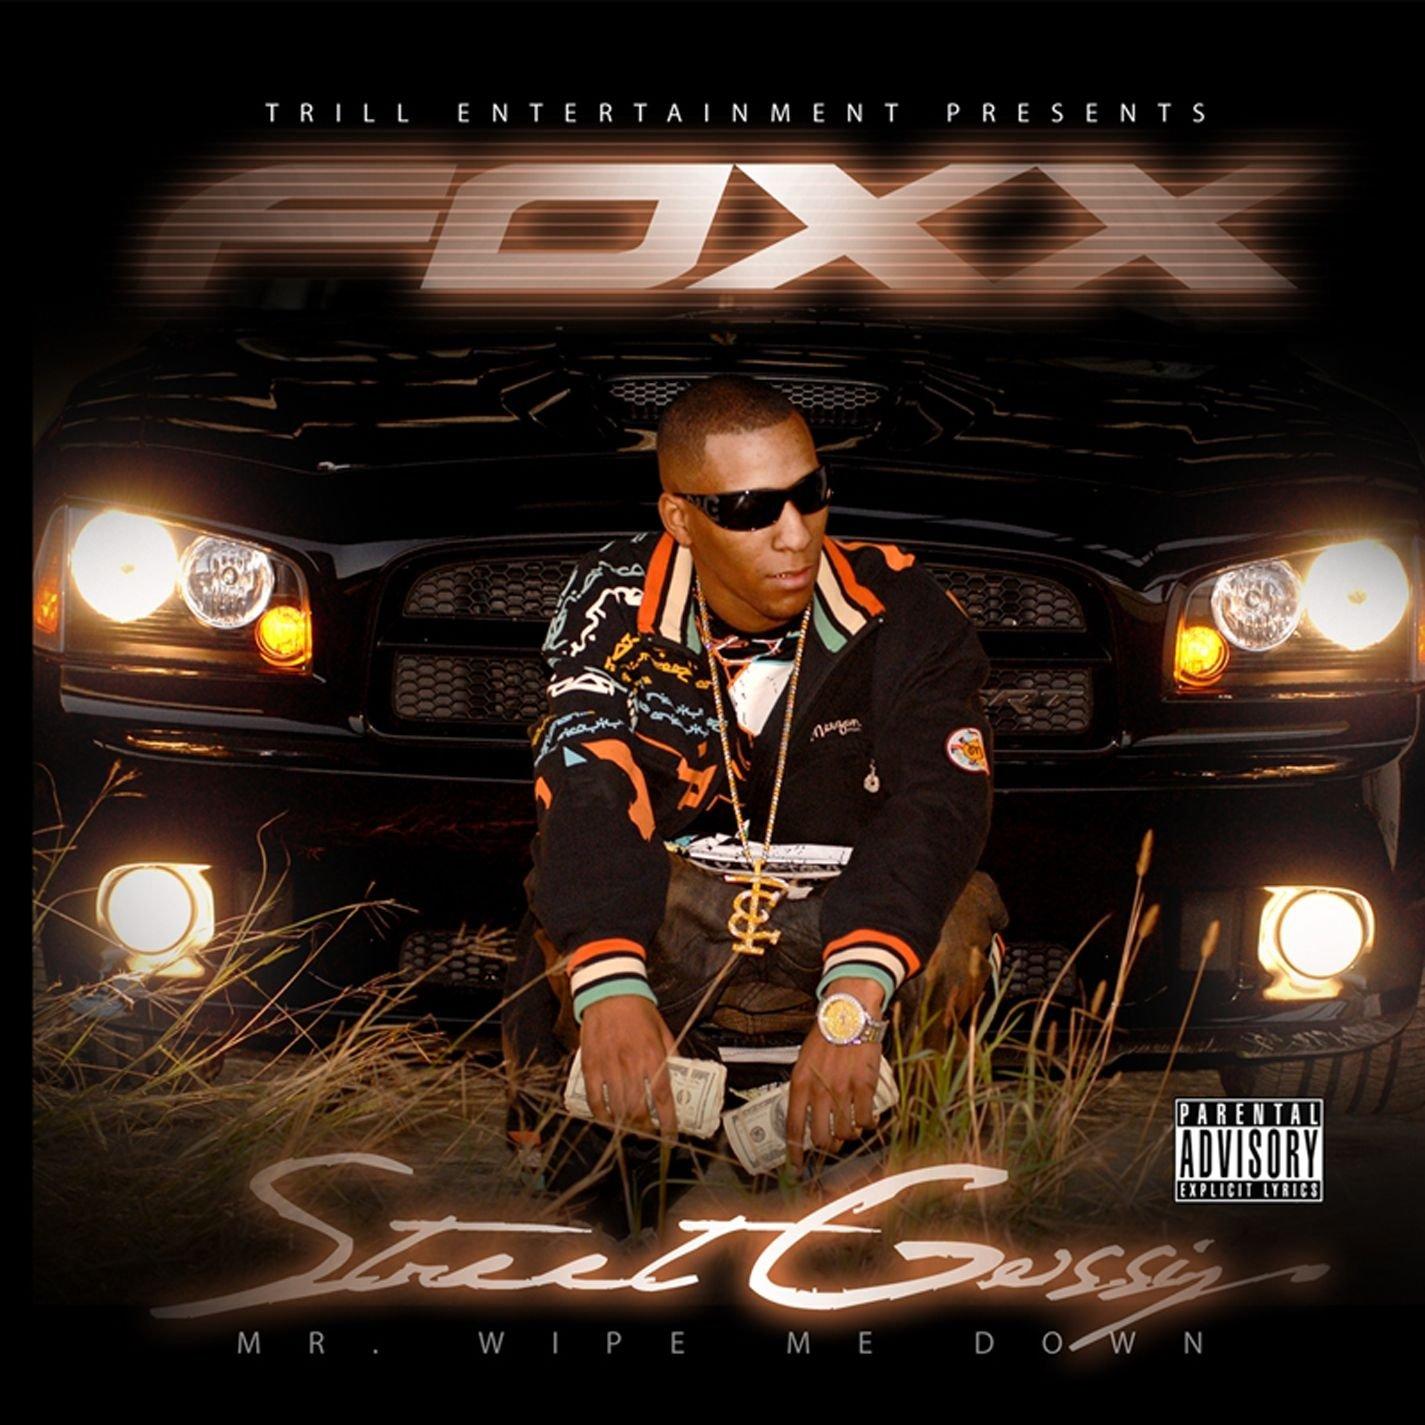 foxx a million street gossip free download